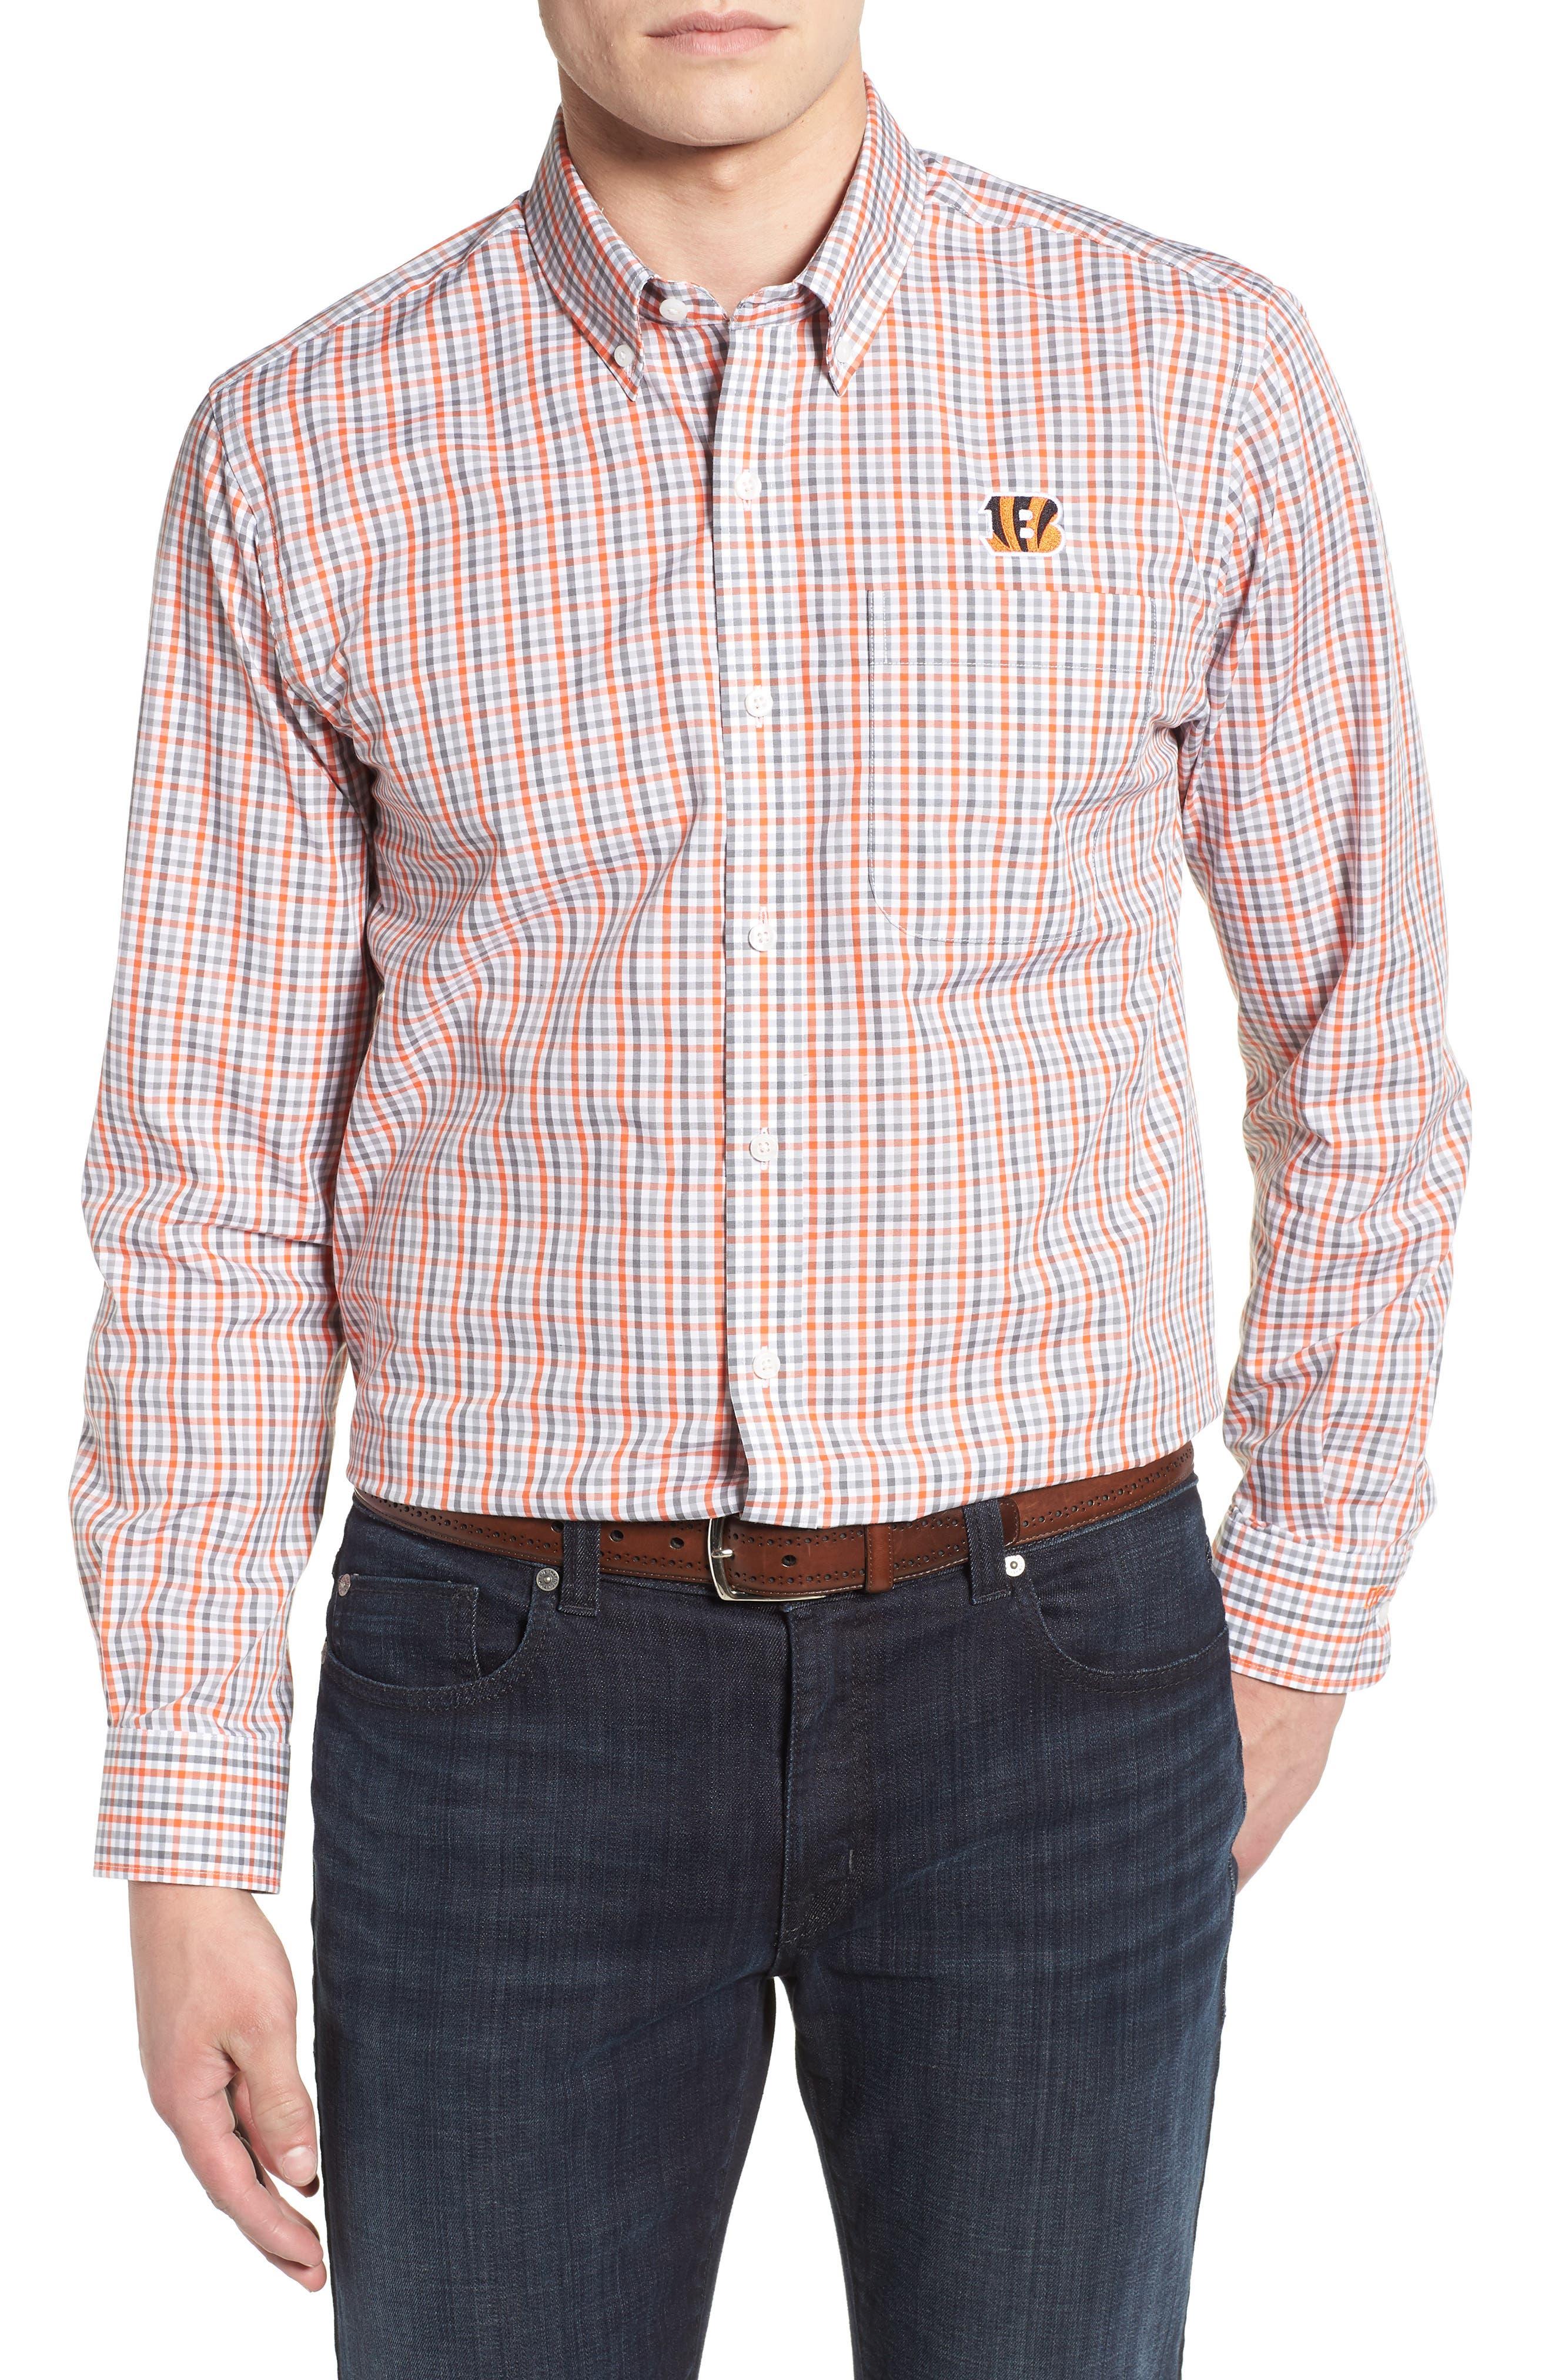 Cincinnati Bengals - Gilman Regular Fit Plaid Sport Shirt,                             Main thumbnail 1, color,                             COLLEGE ORANGE